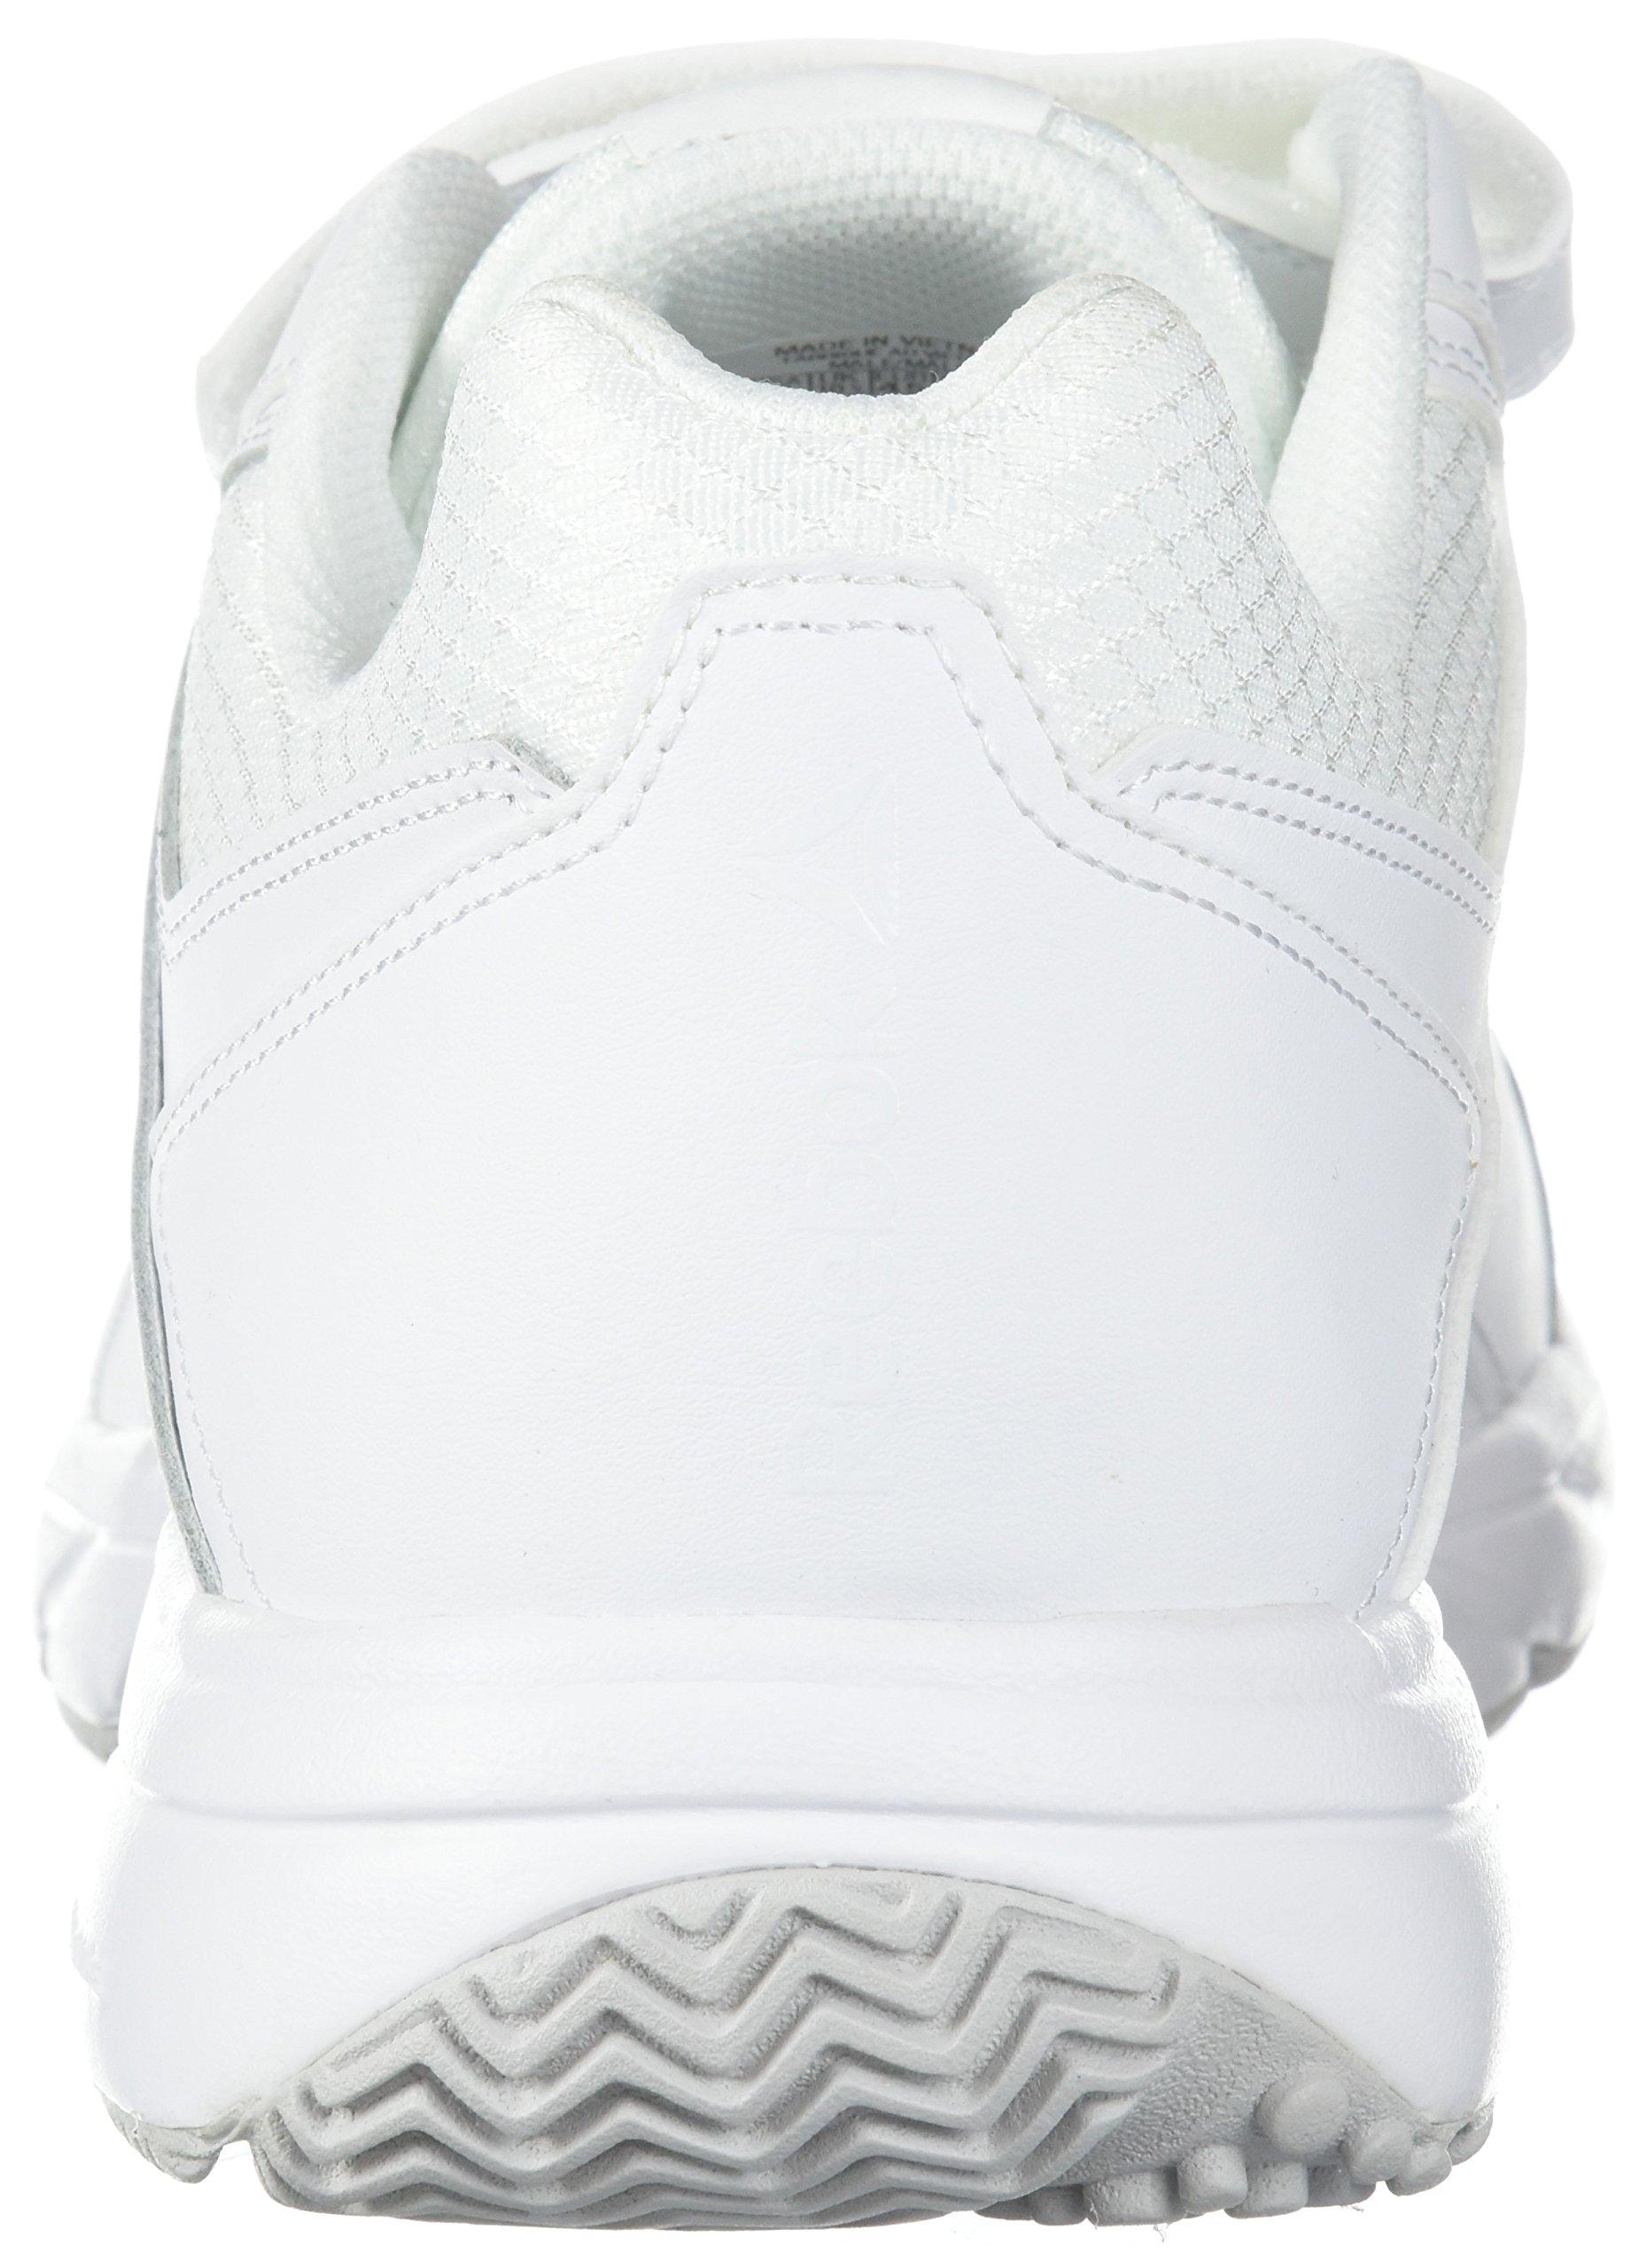 7874d887dfb4a ایگرد - خرید از آمازون | Reebok Men's Work N Cushion 3.0 Kc Walking Shoe